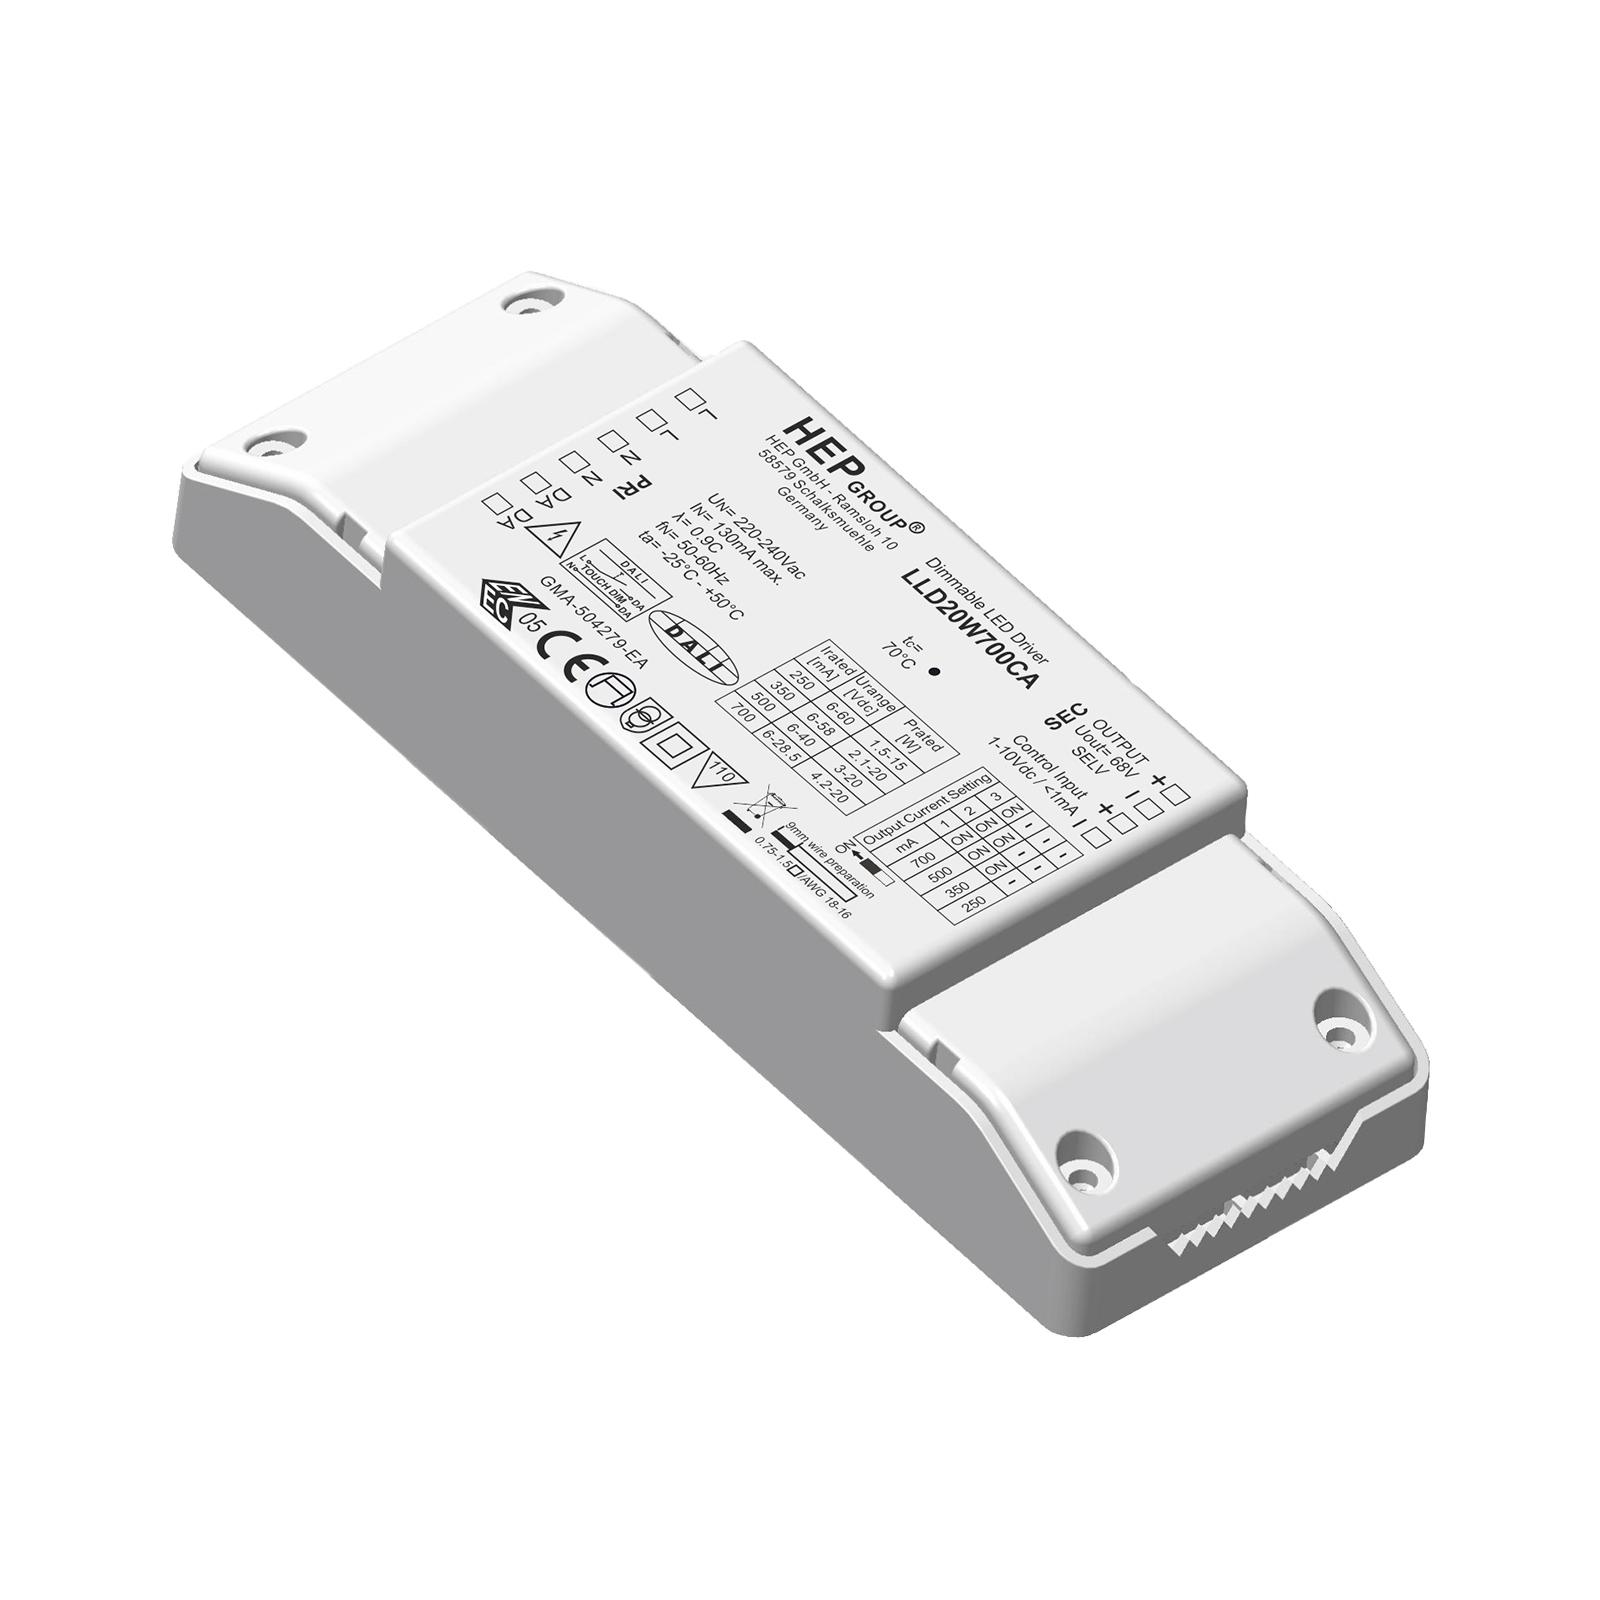 LED-Treiber LLD, 20 W, 700 mA, dimmbar, CC